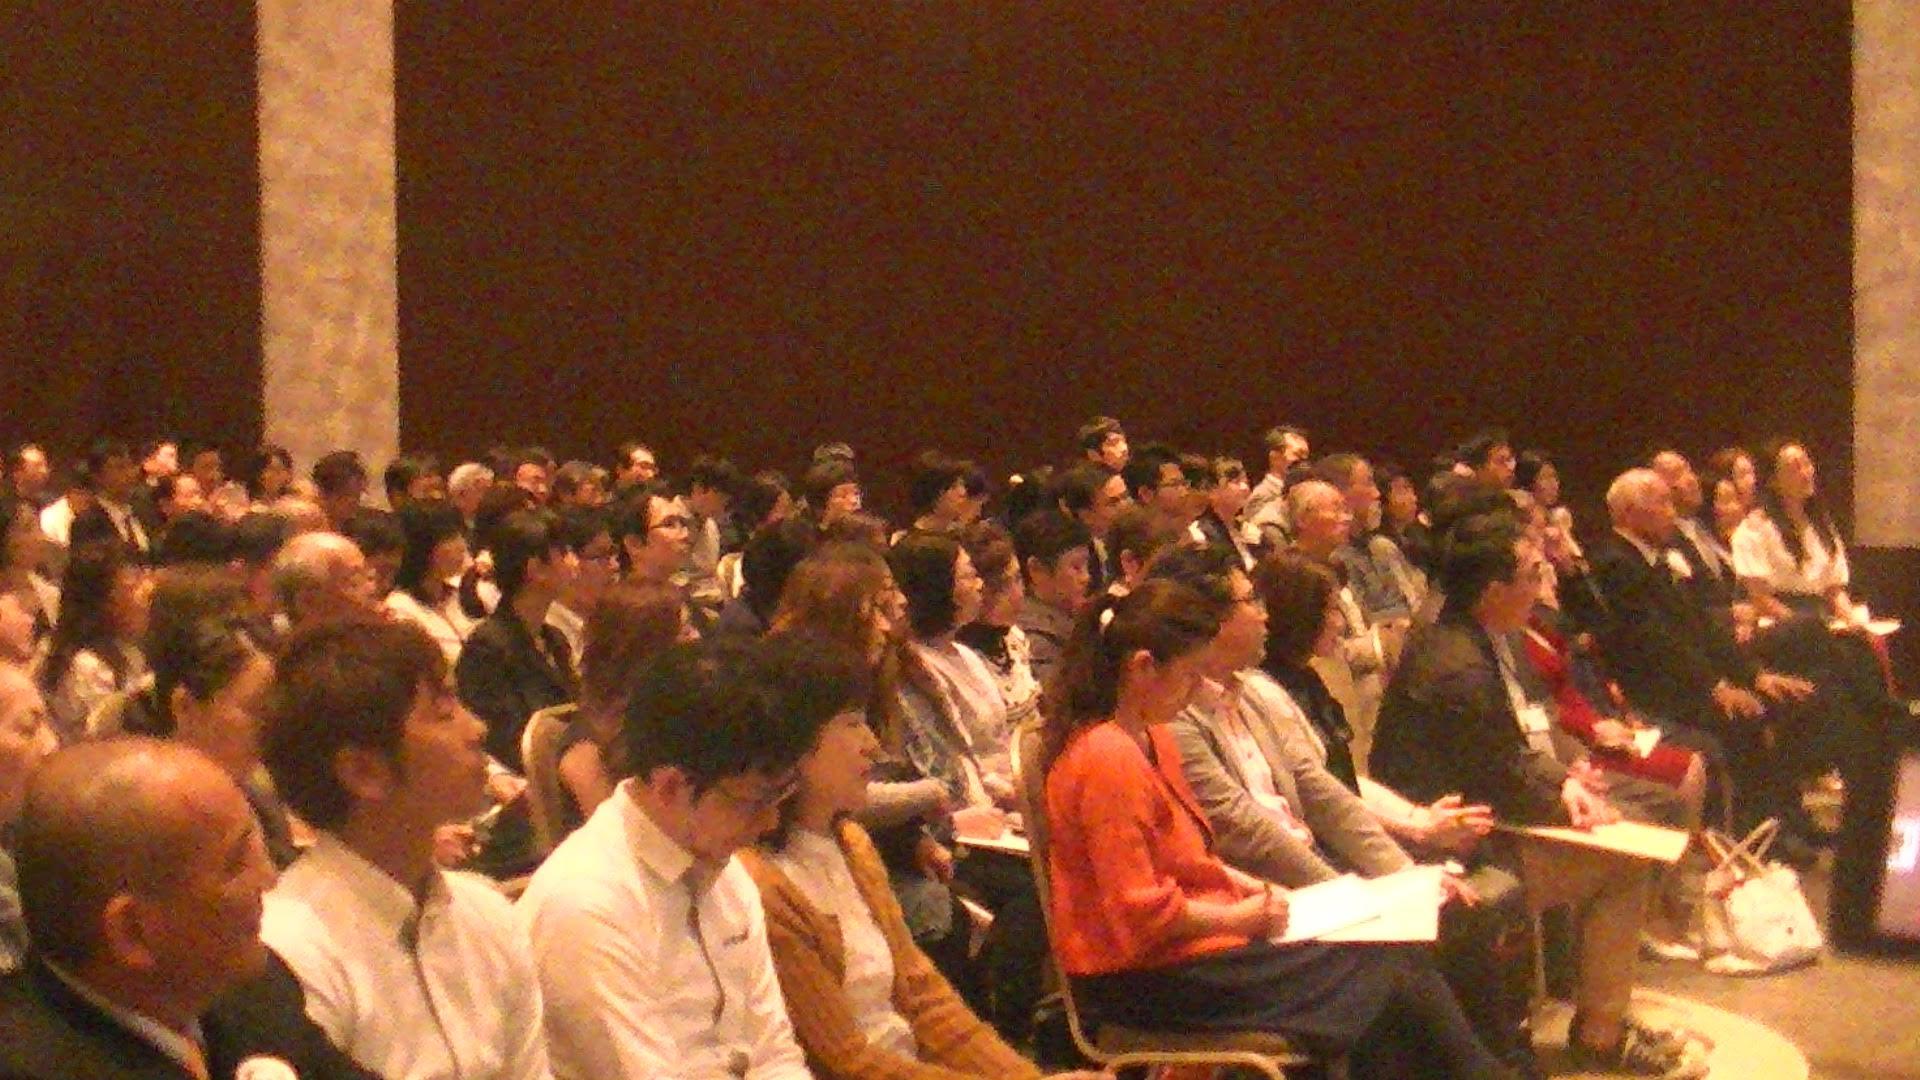 PIC 1773 1 - 思風会全国大会in広島